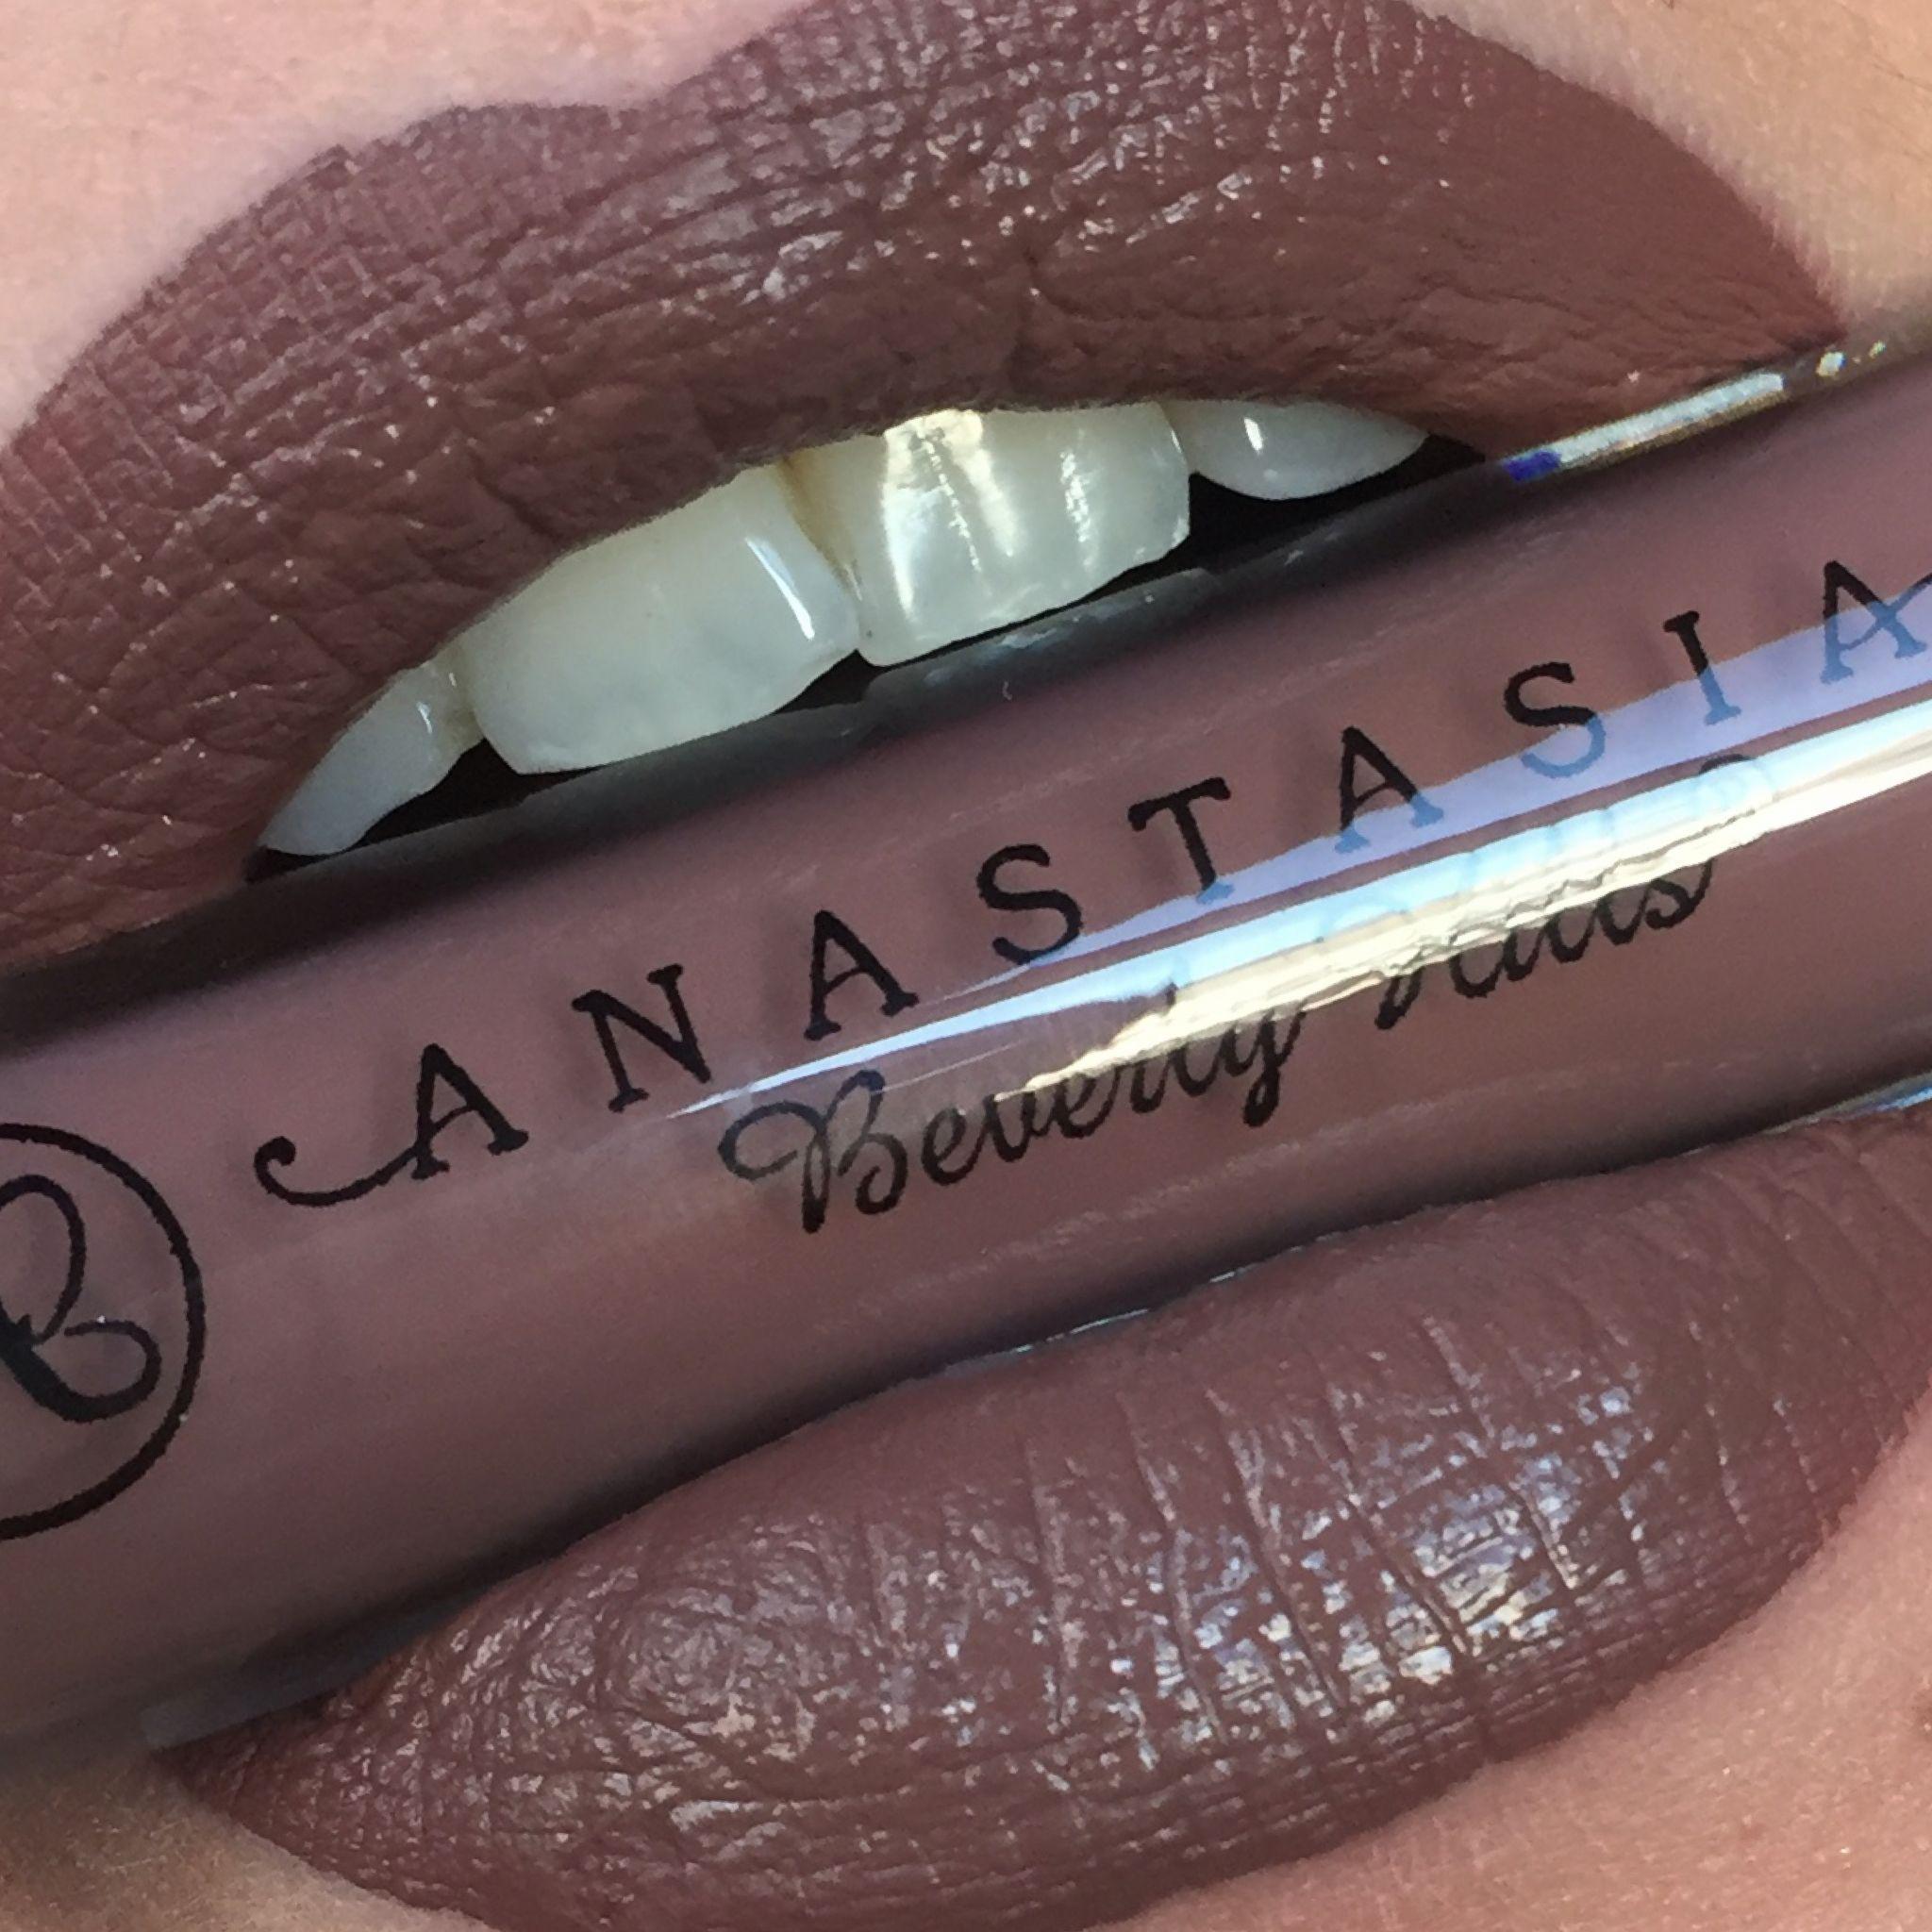 Anastasia Beverly Hills Liquid Lipstick Sepia LipSwatch